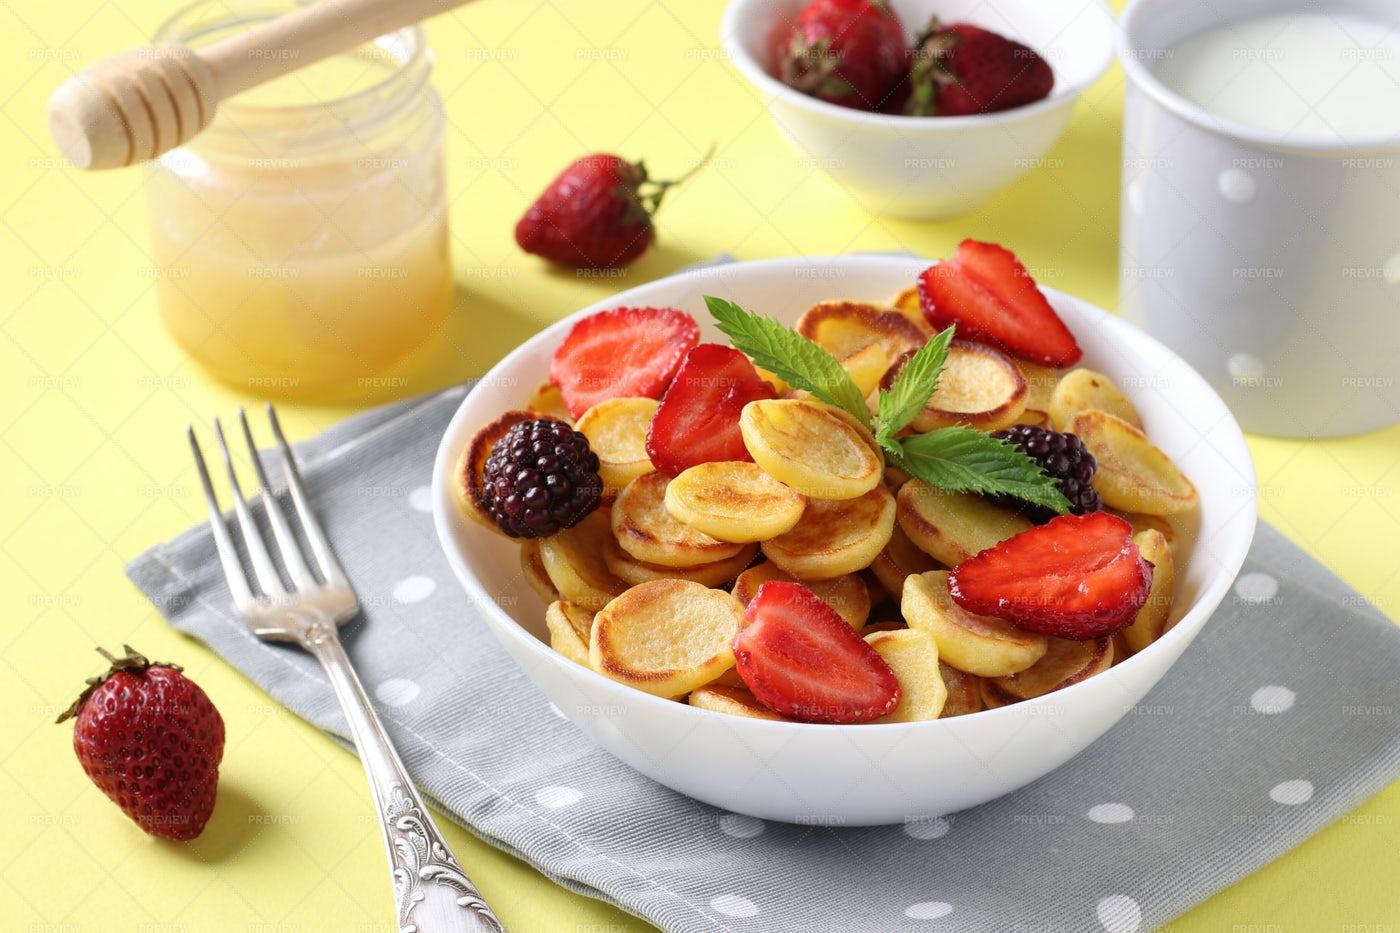 Tiny Pancakes For Breakfast: Stock Photos